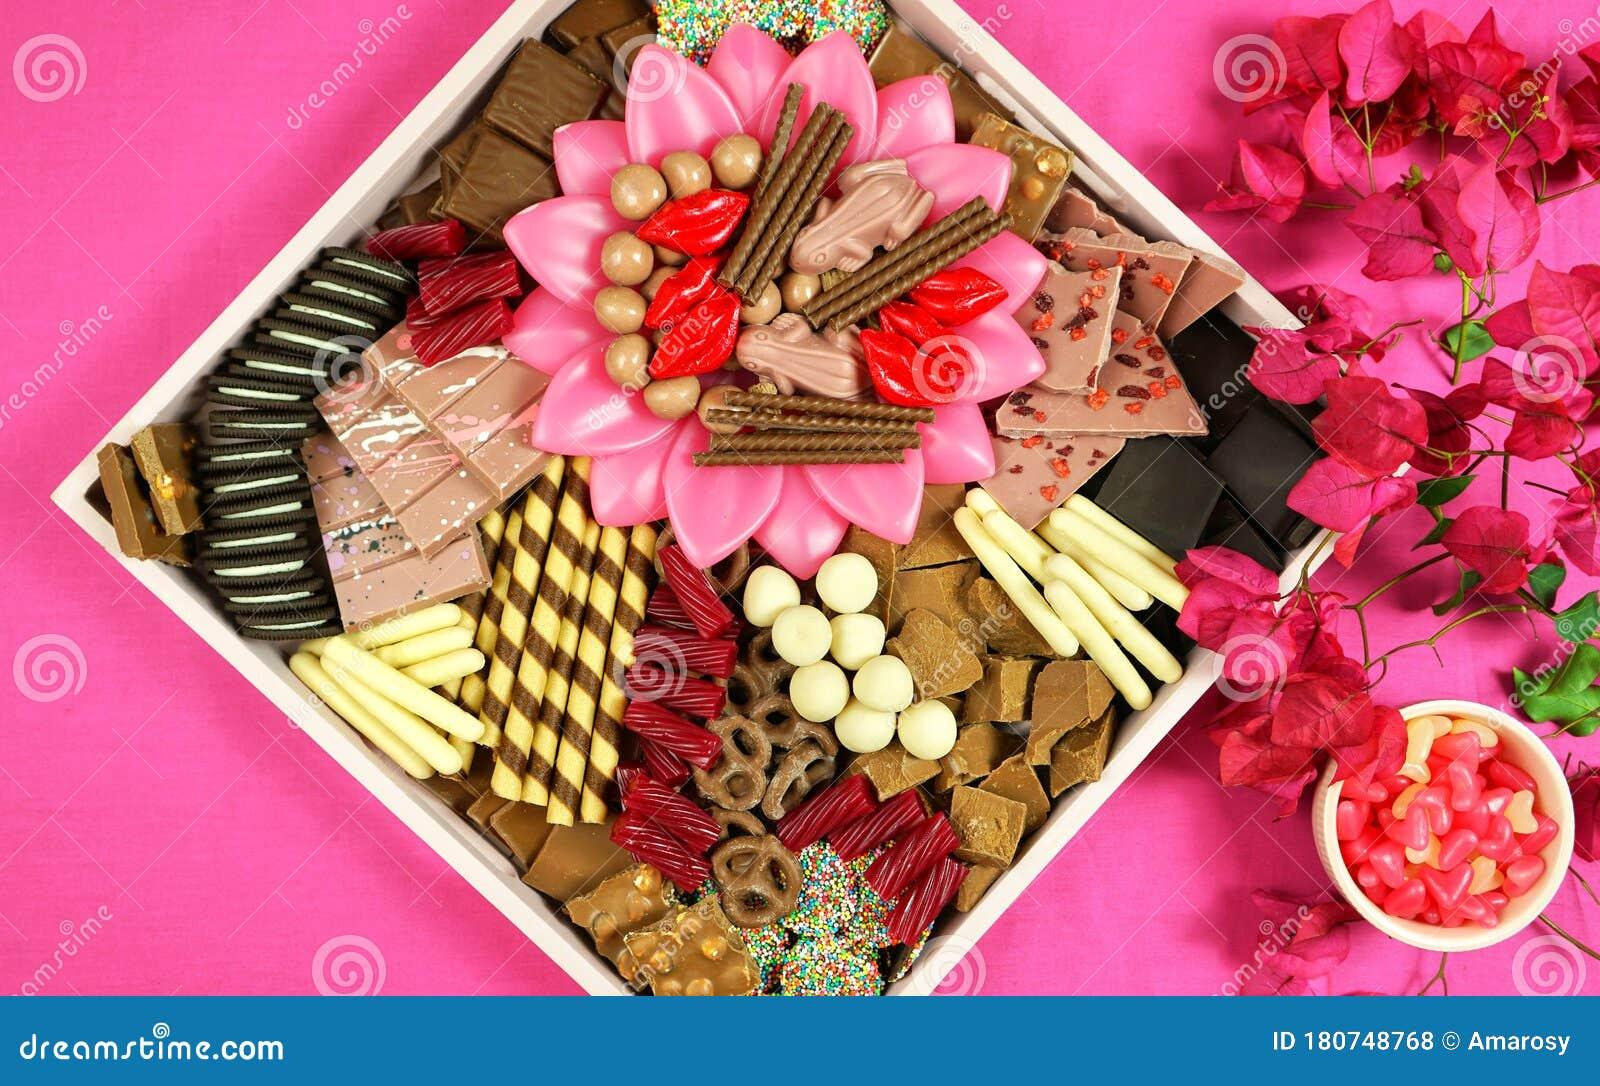 Chocolate Dessert Charcuterie Grazing Platter Tray On Modern Pink Background Stock Photo Image Of Food Celebration 180748768